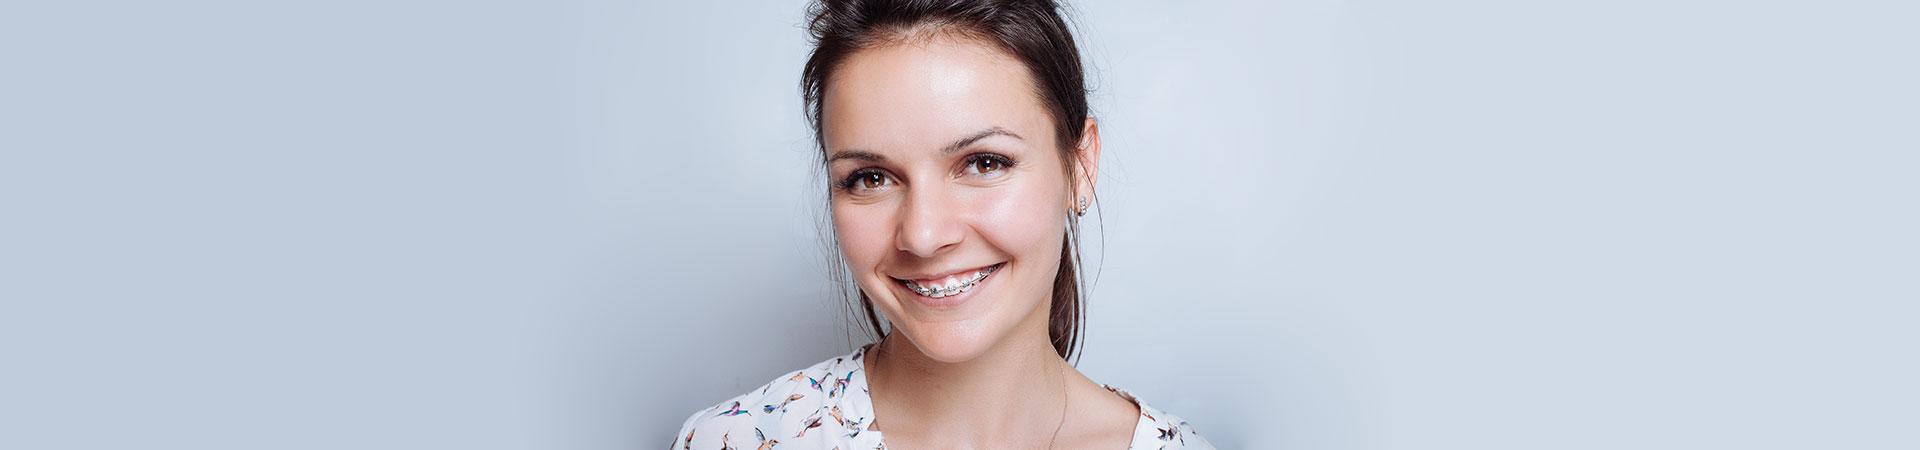 Adult woman wearing orthodontic braces.